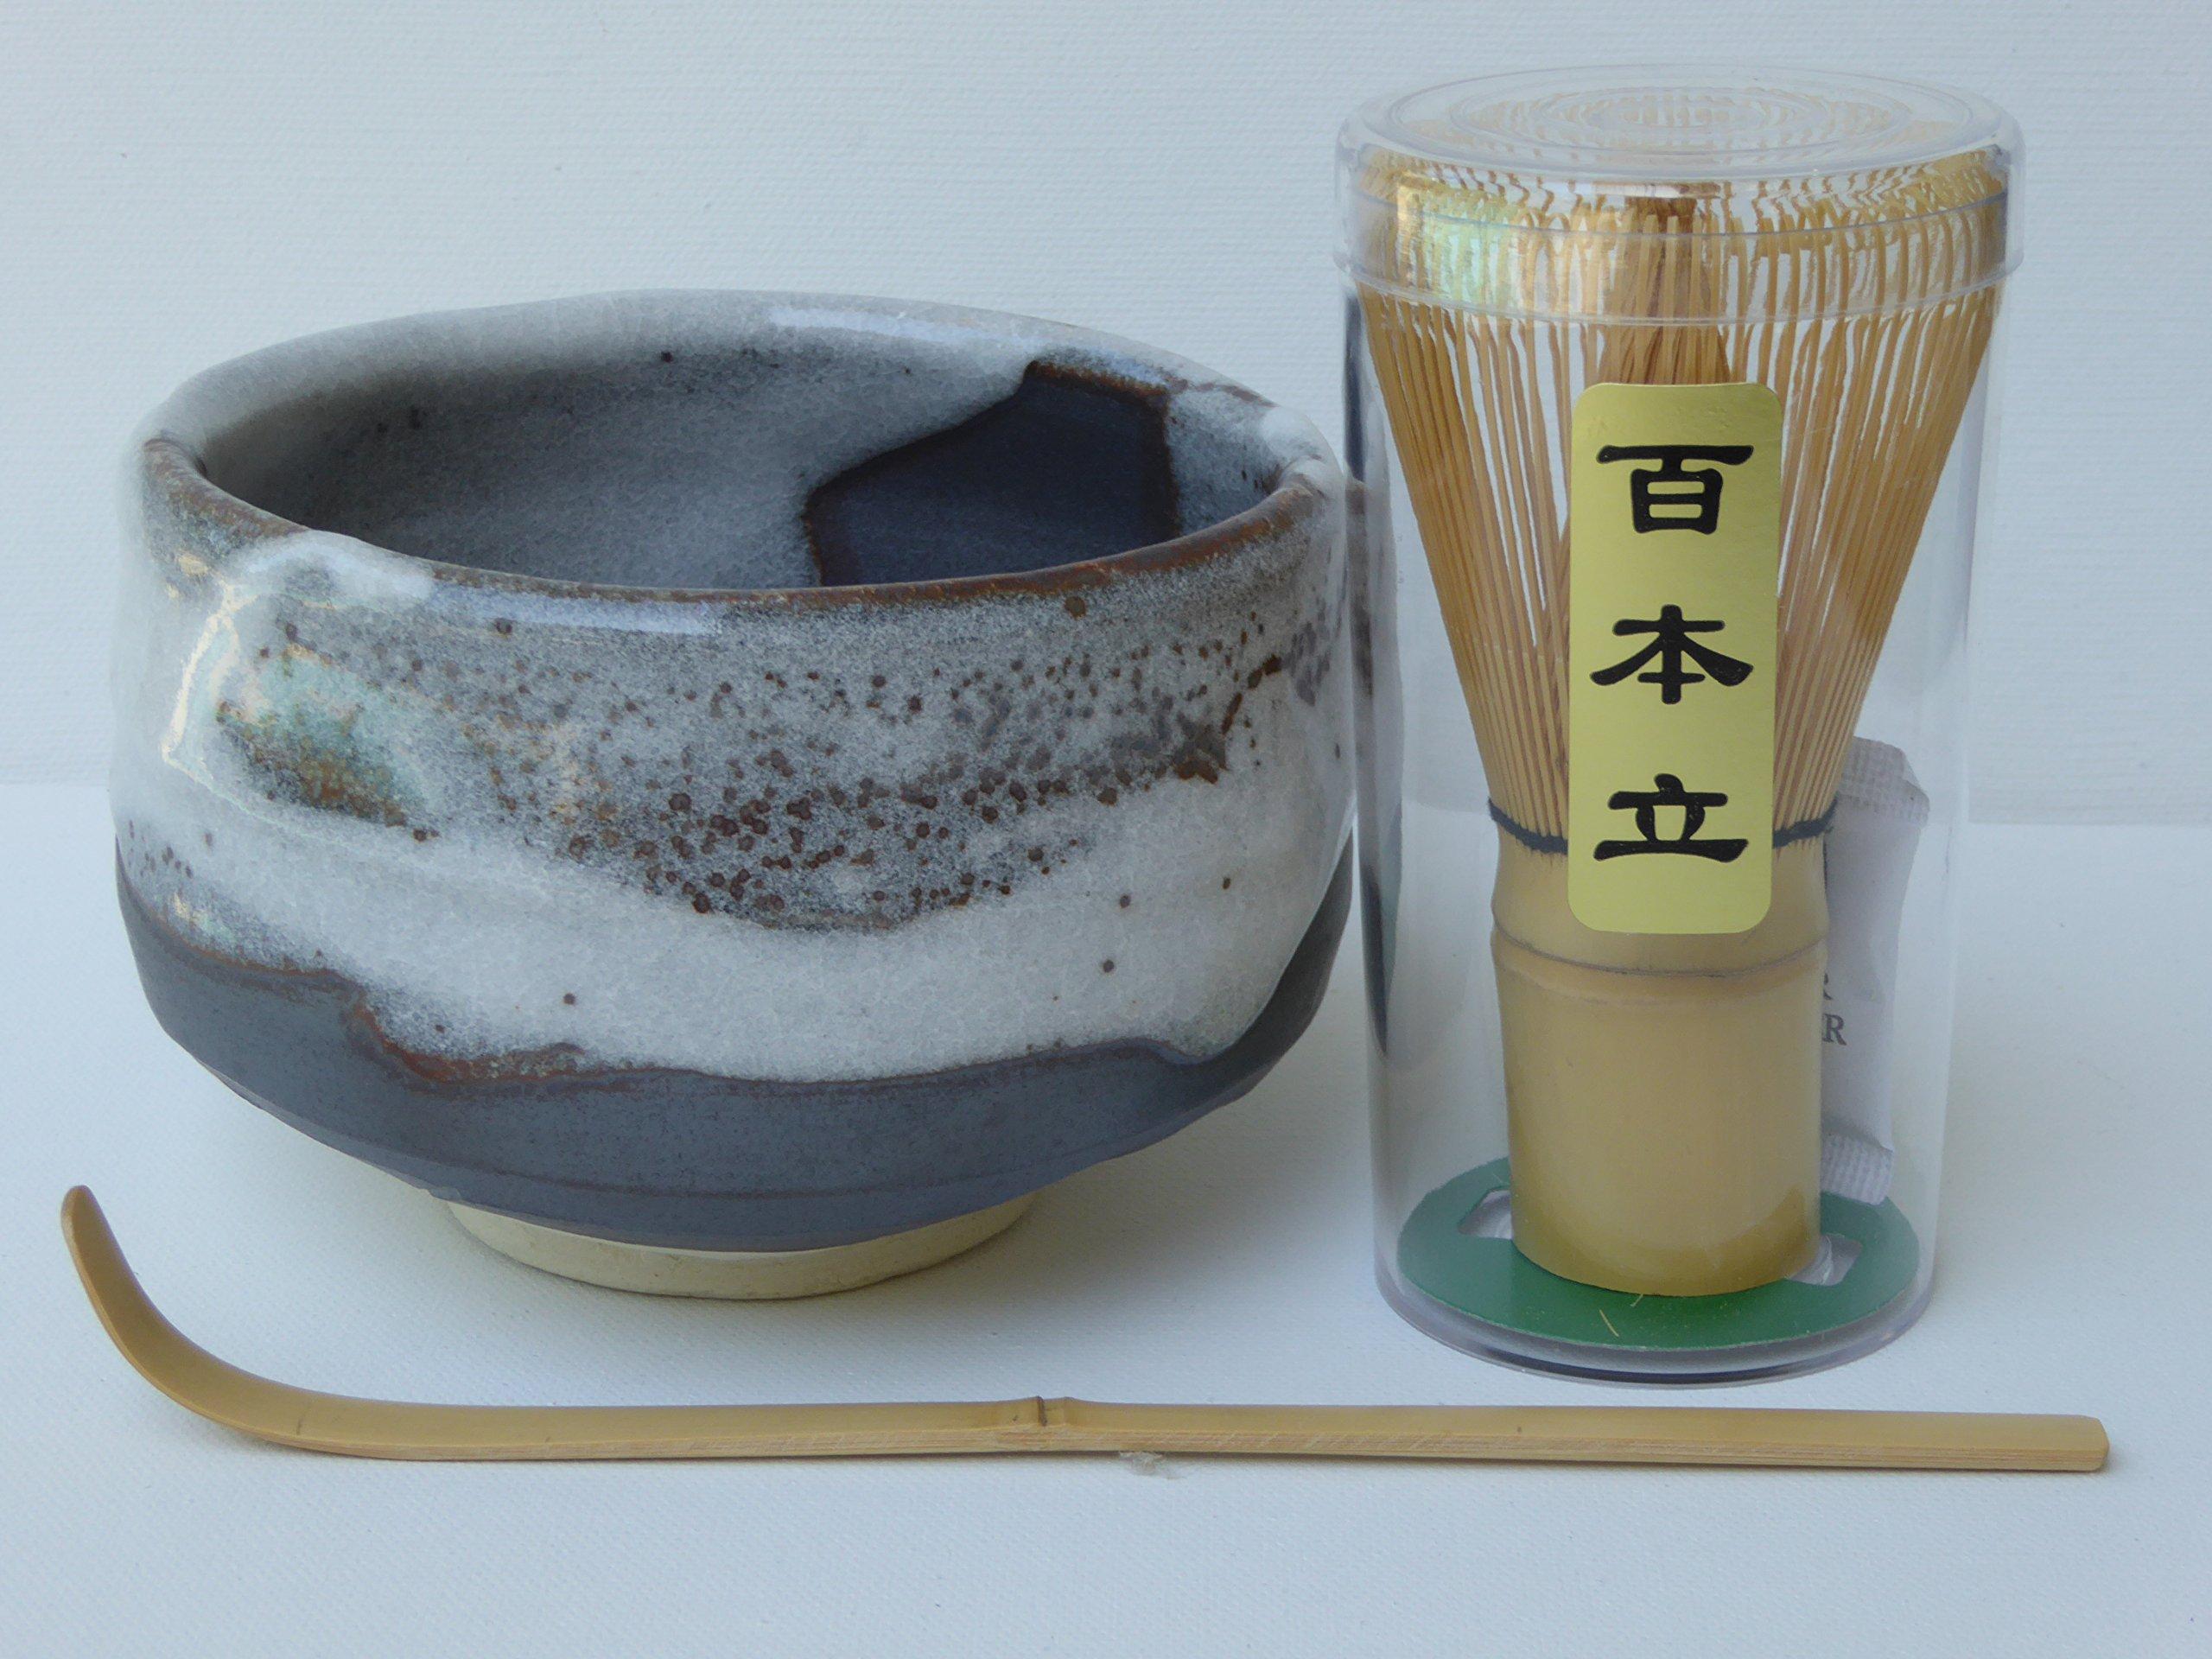 YokohamaUSA Matcha Bowl Set SHINSETSU Bamboo Scoop 100 Whisk/ Made in Japan by KUMI